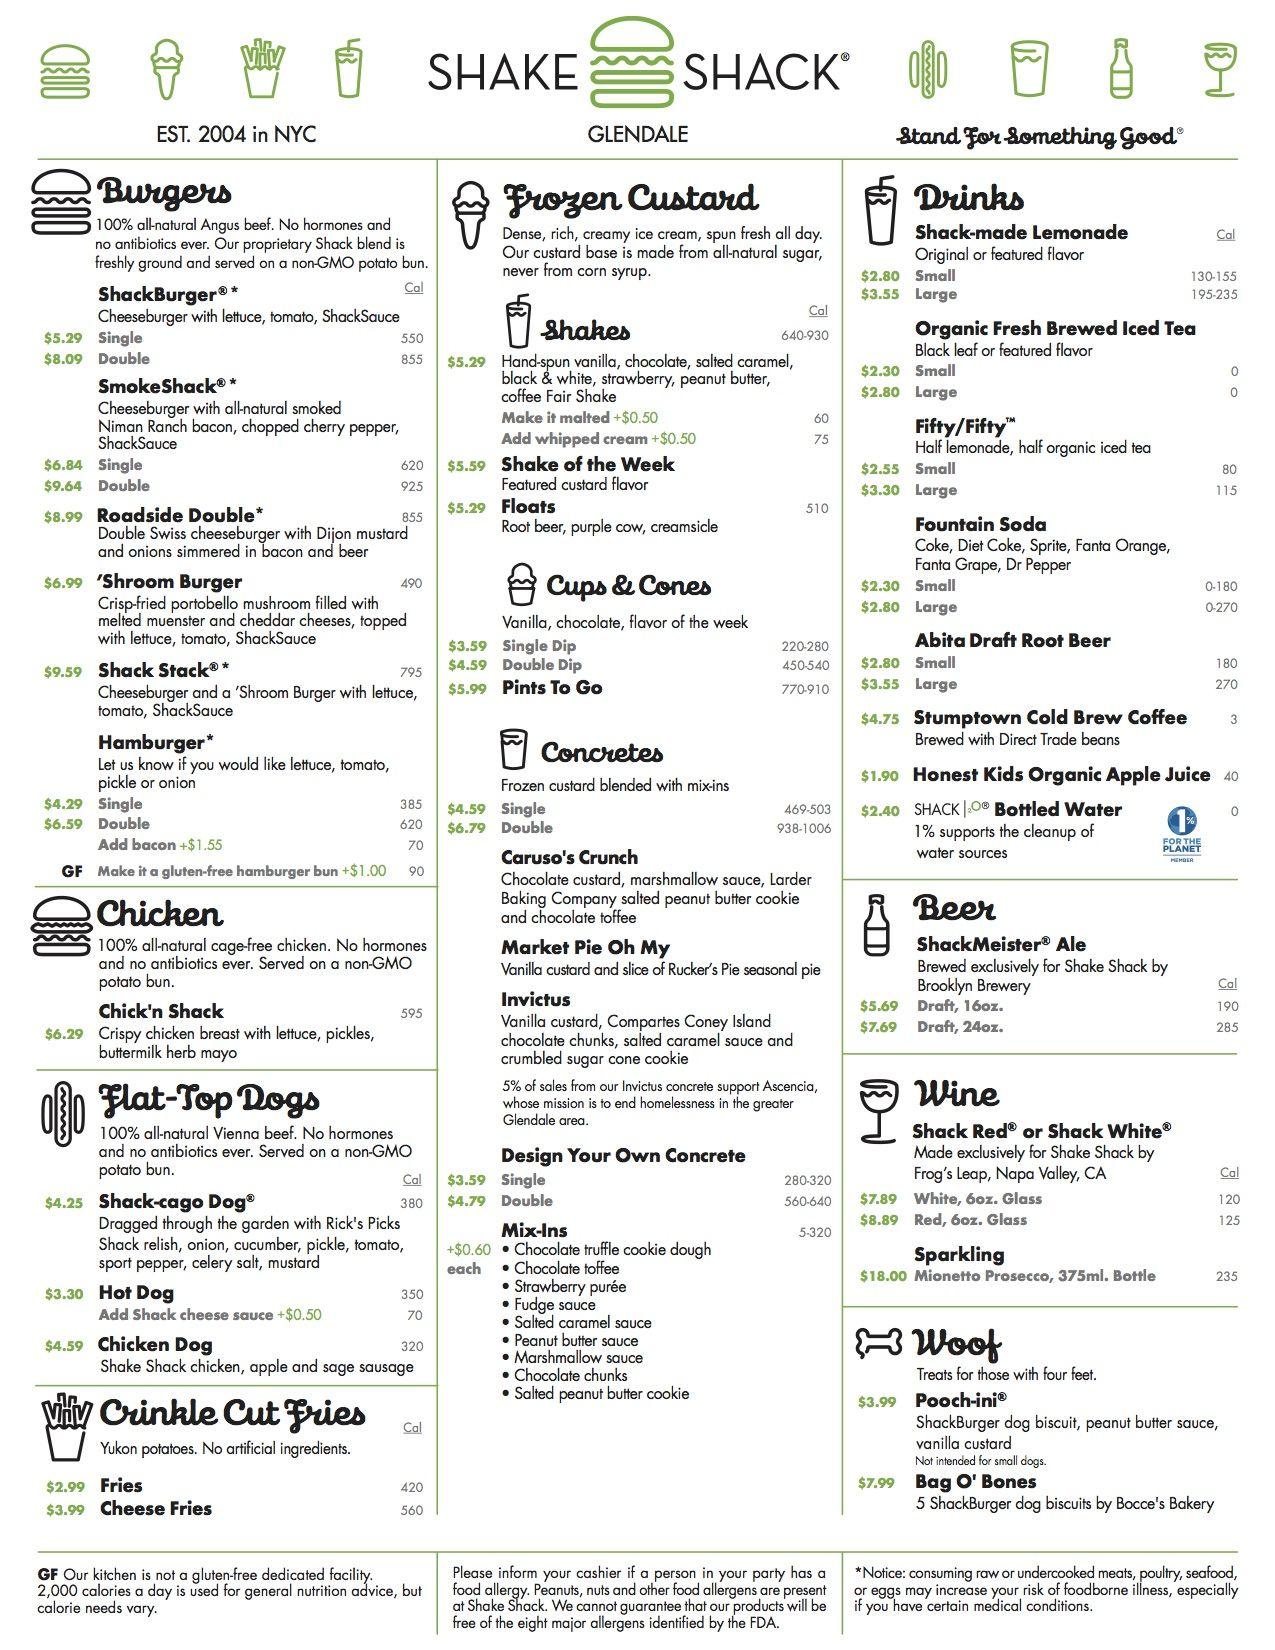 Glendale Shake Shack Menu | Local Travel & Food | Pinterest | Shake ...